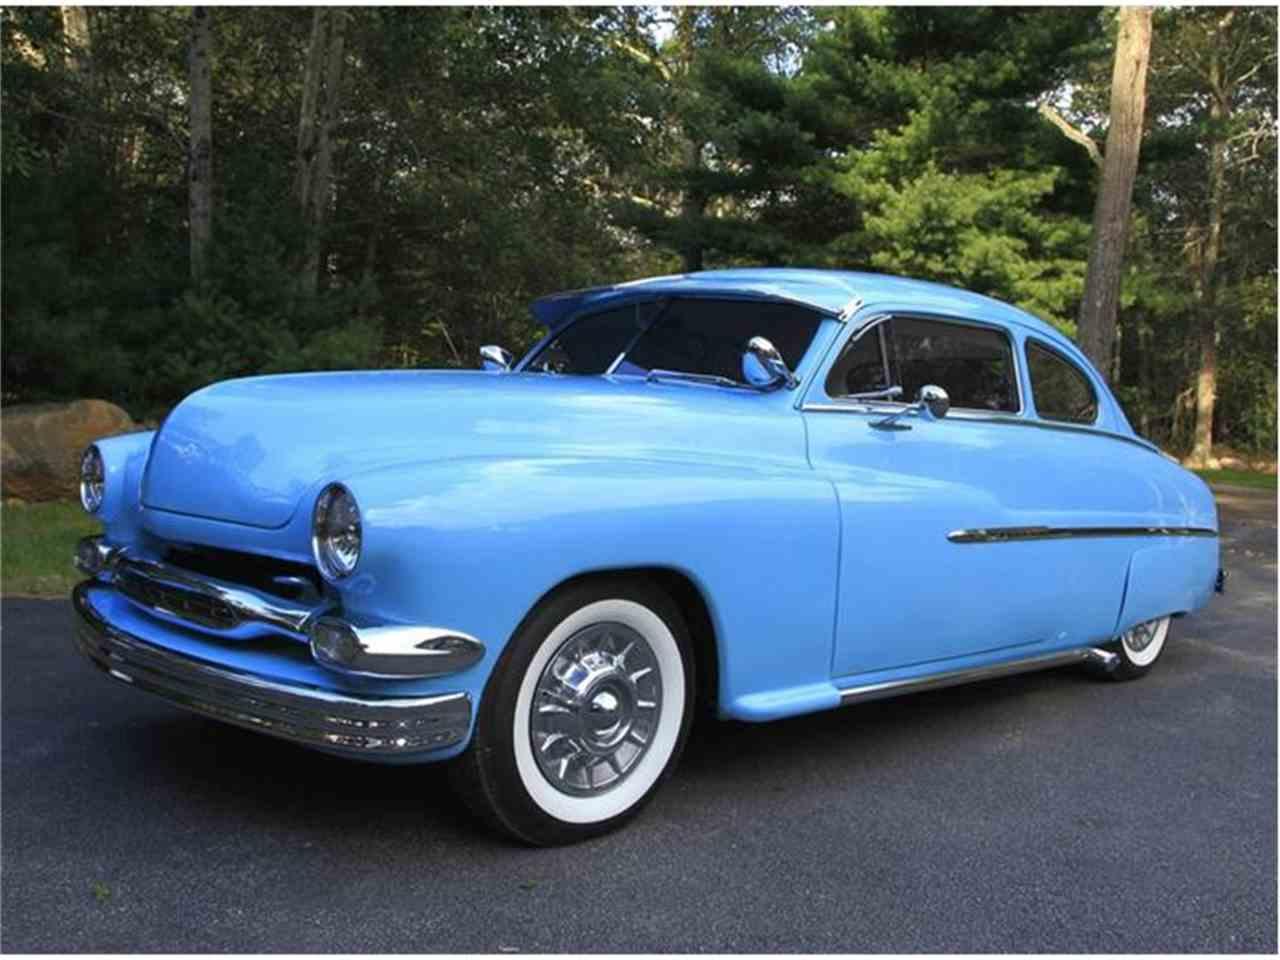 1950 Mercury Coupe for Sale | ClassicCars.com | CC-4784321950s Cars For Sale Cheap